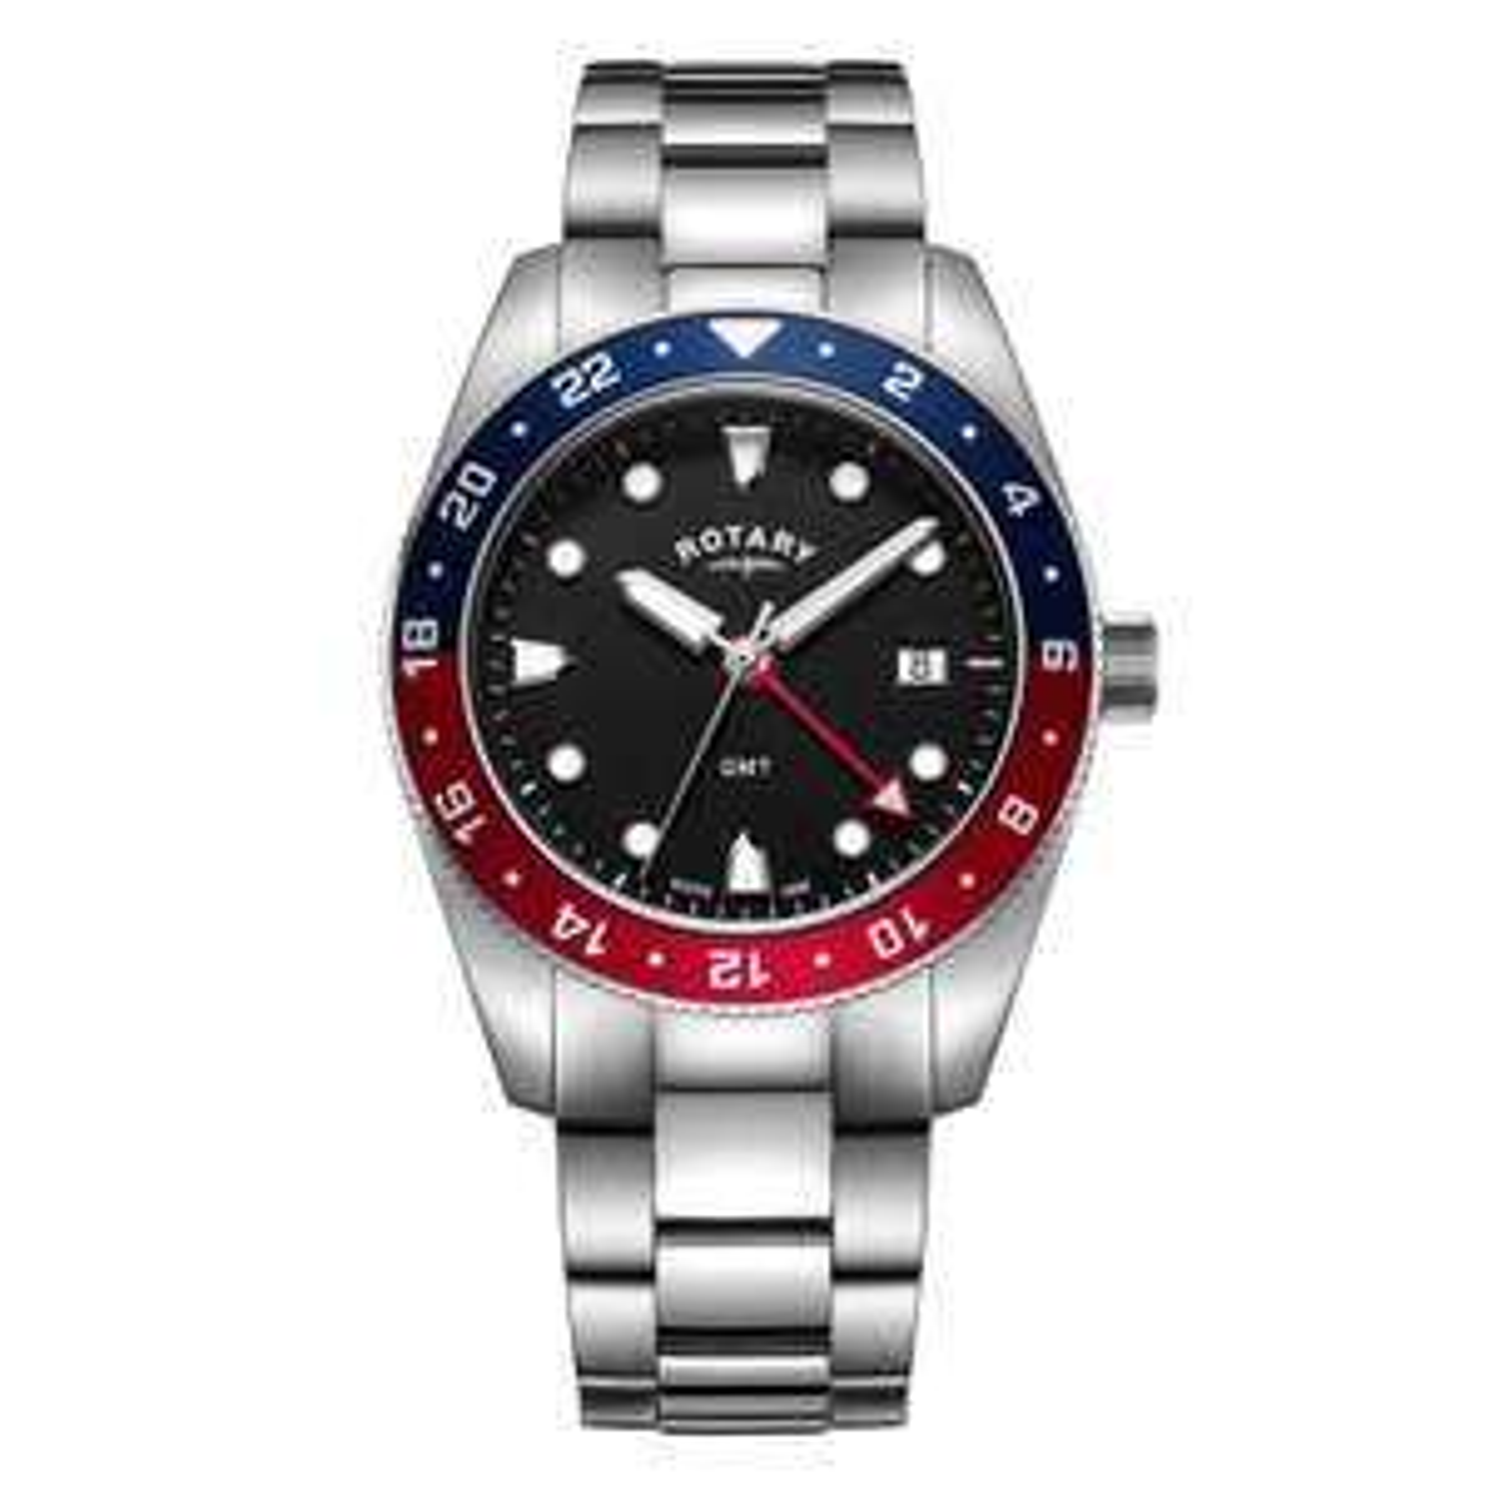 Rotary Men's Stainless Steel Bracelet Watch £79.99 @ H Samuel